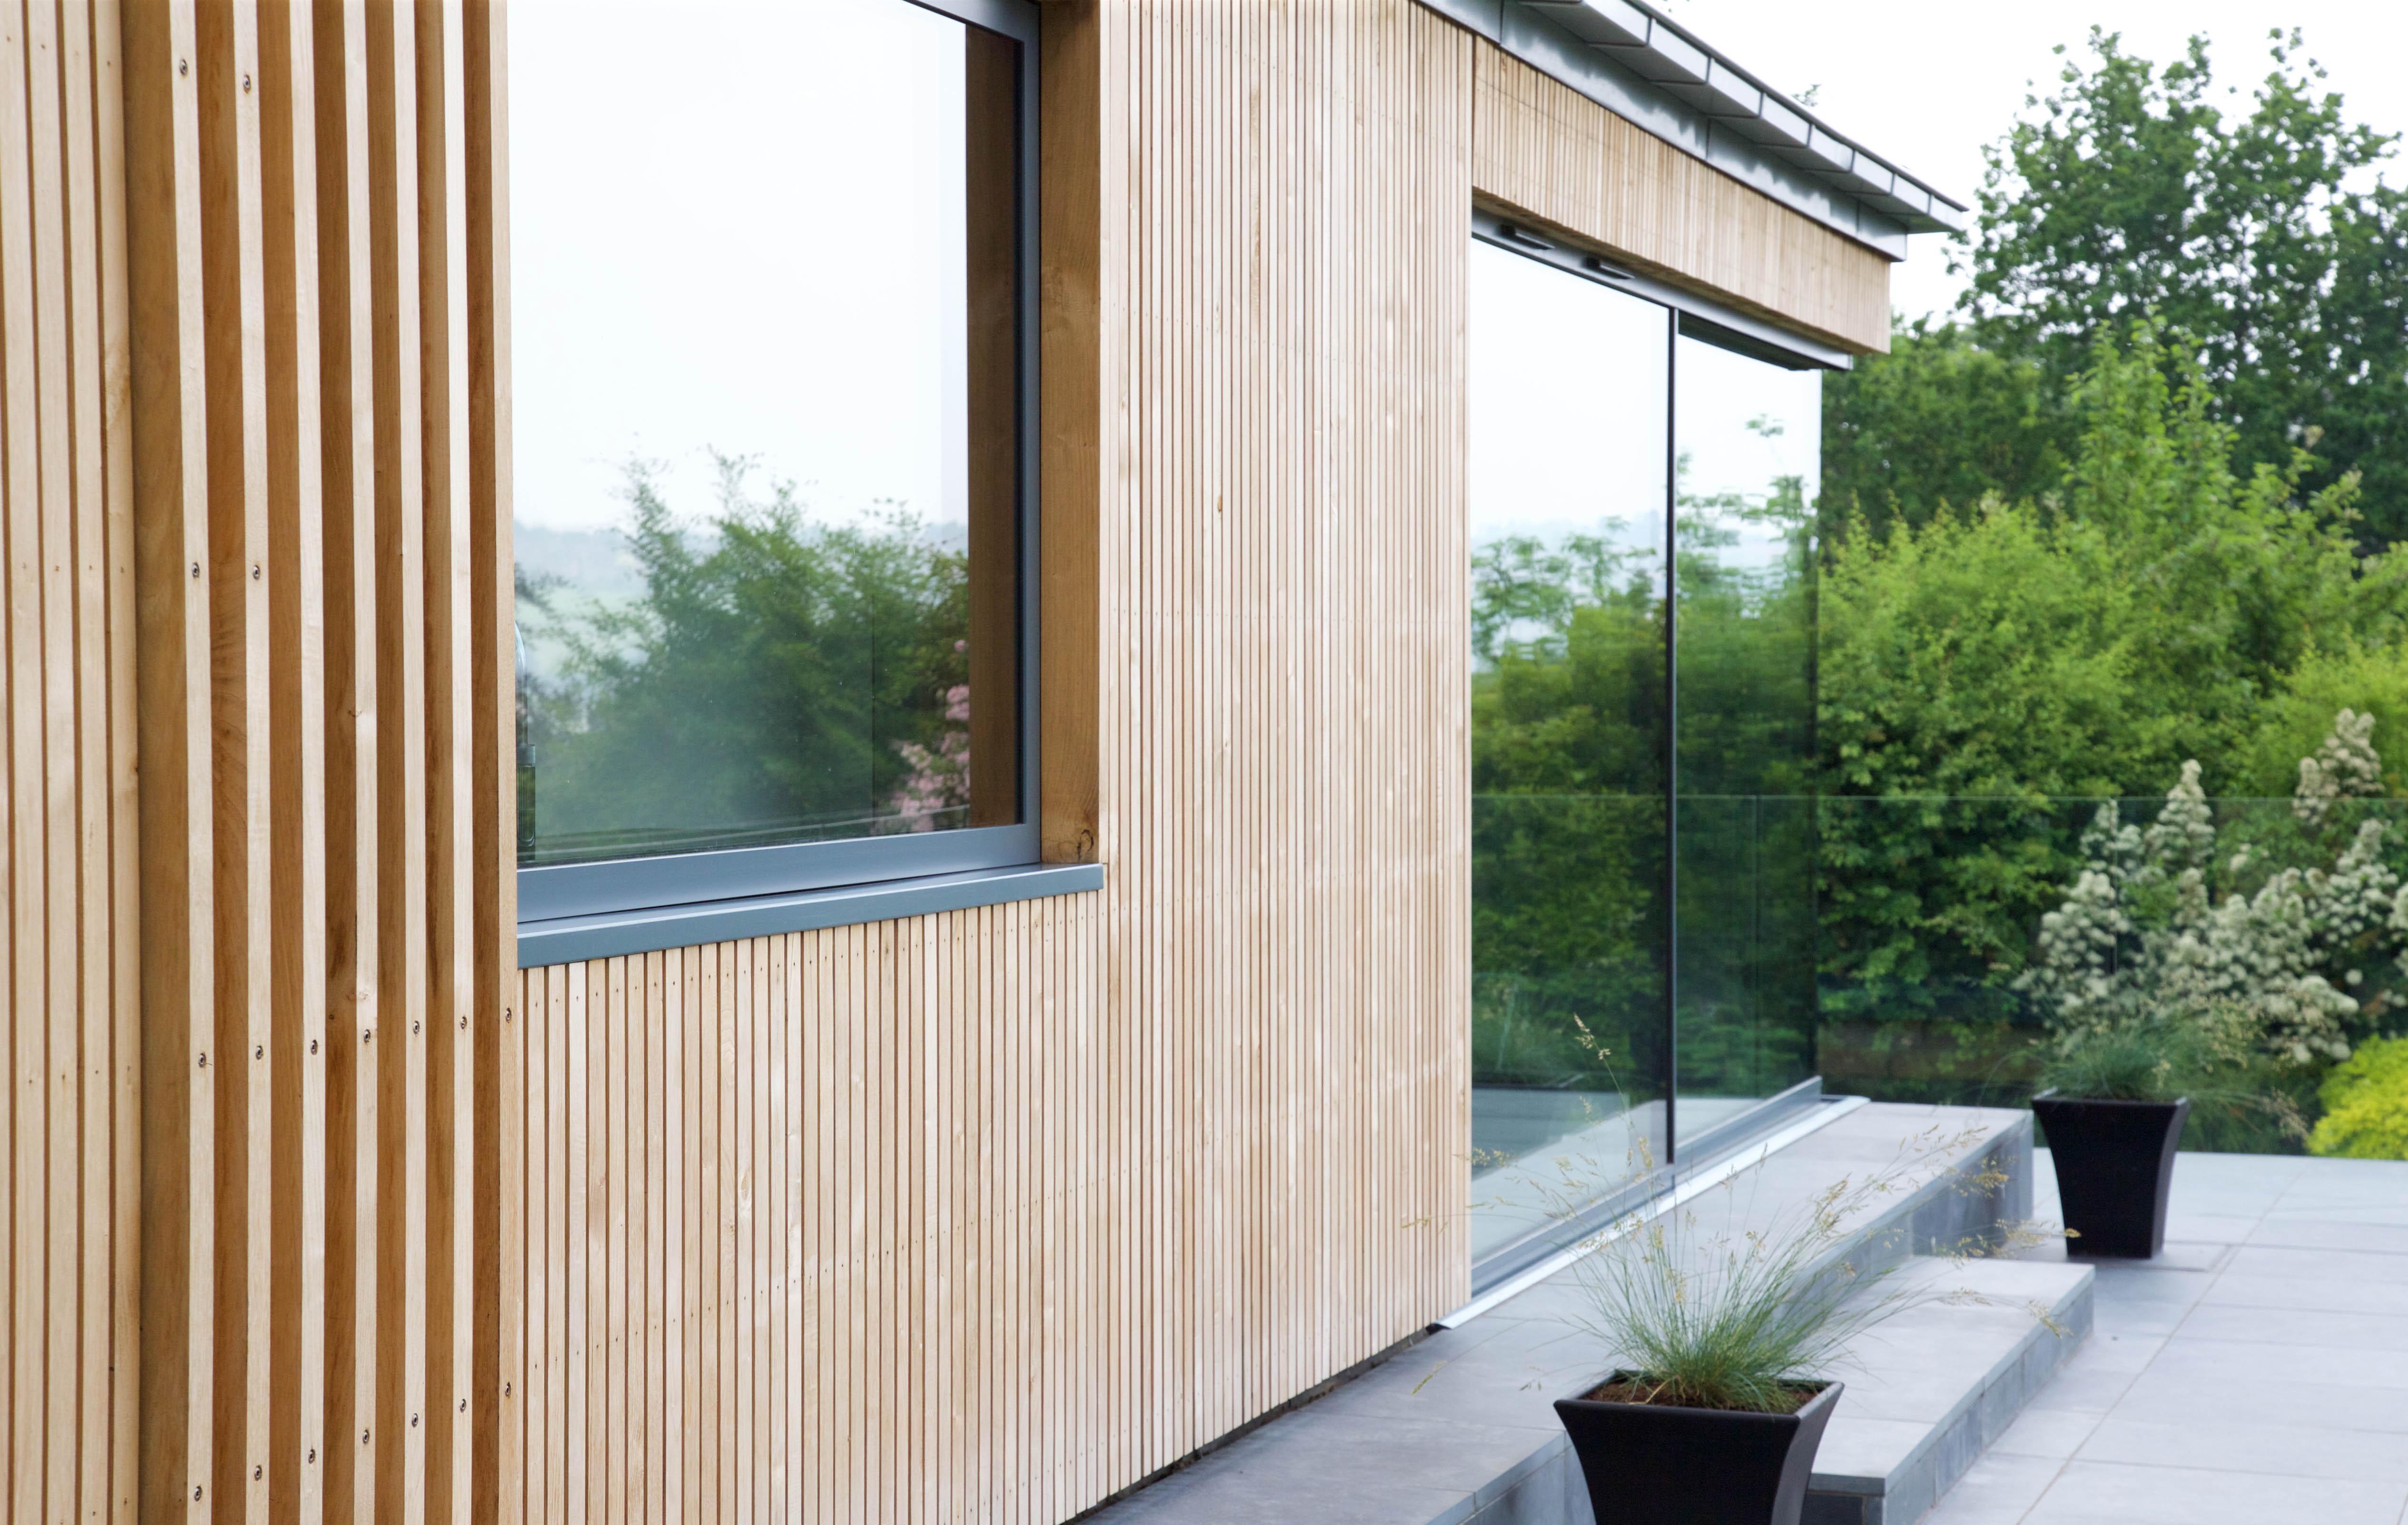 MJW Architects